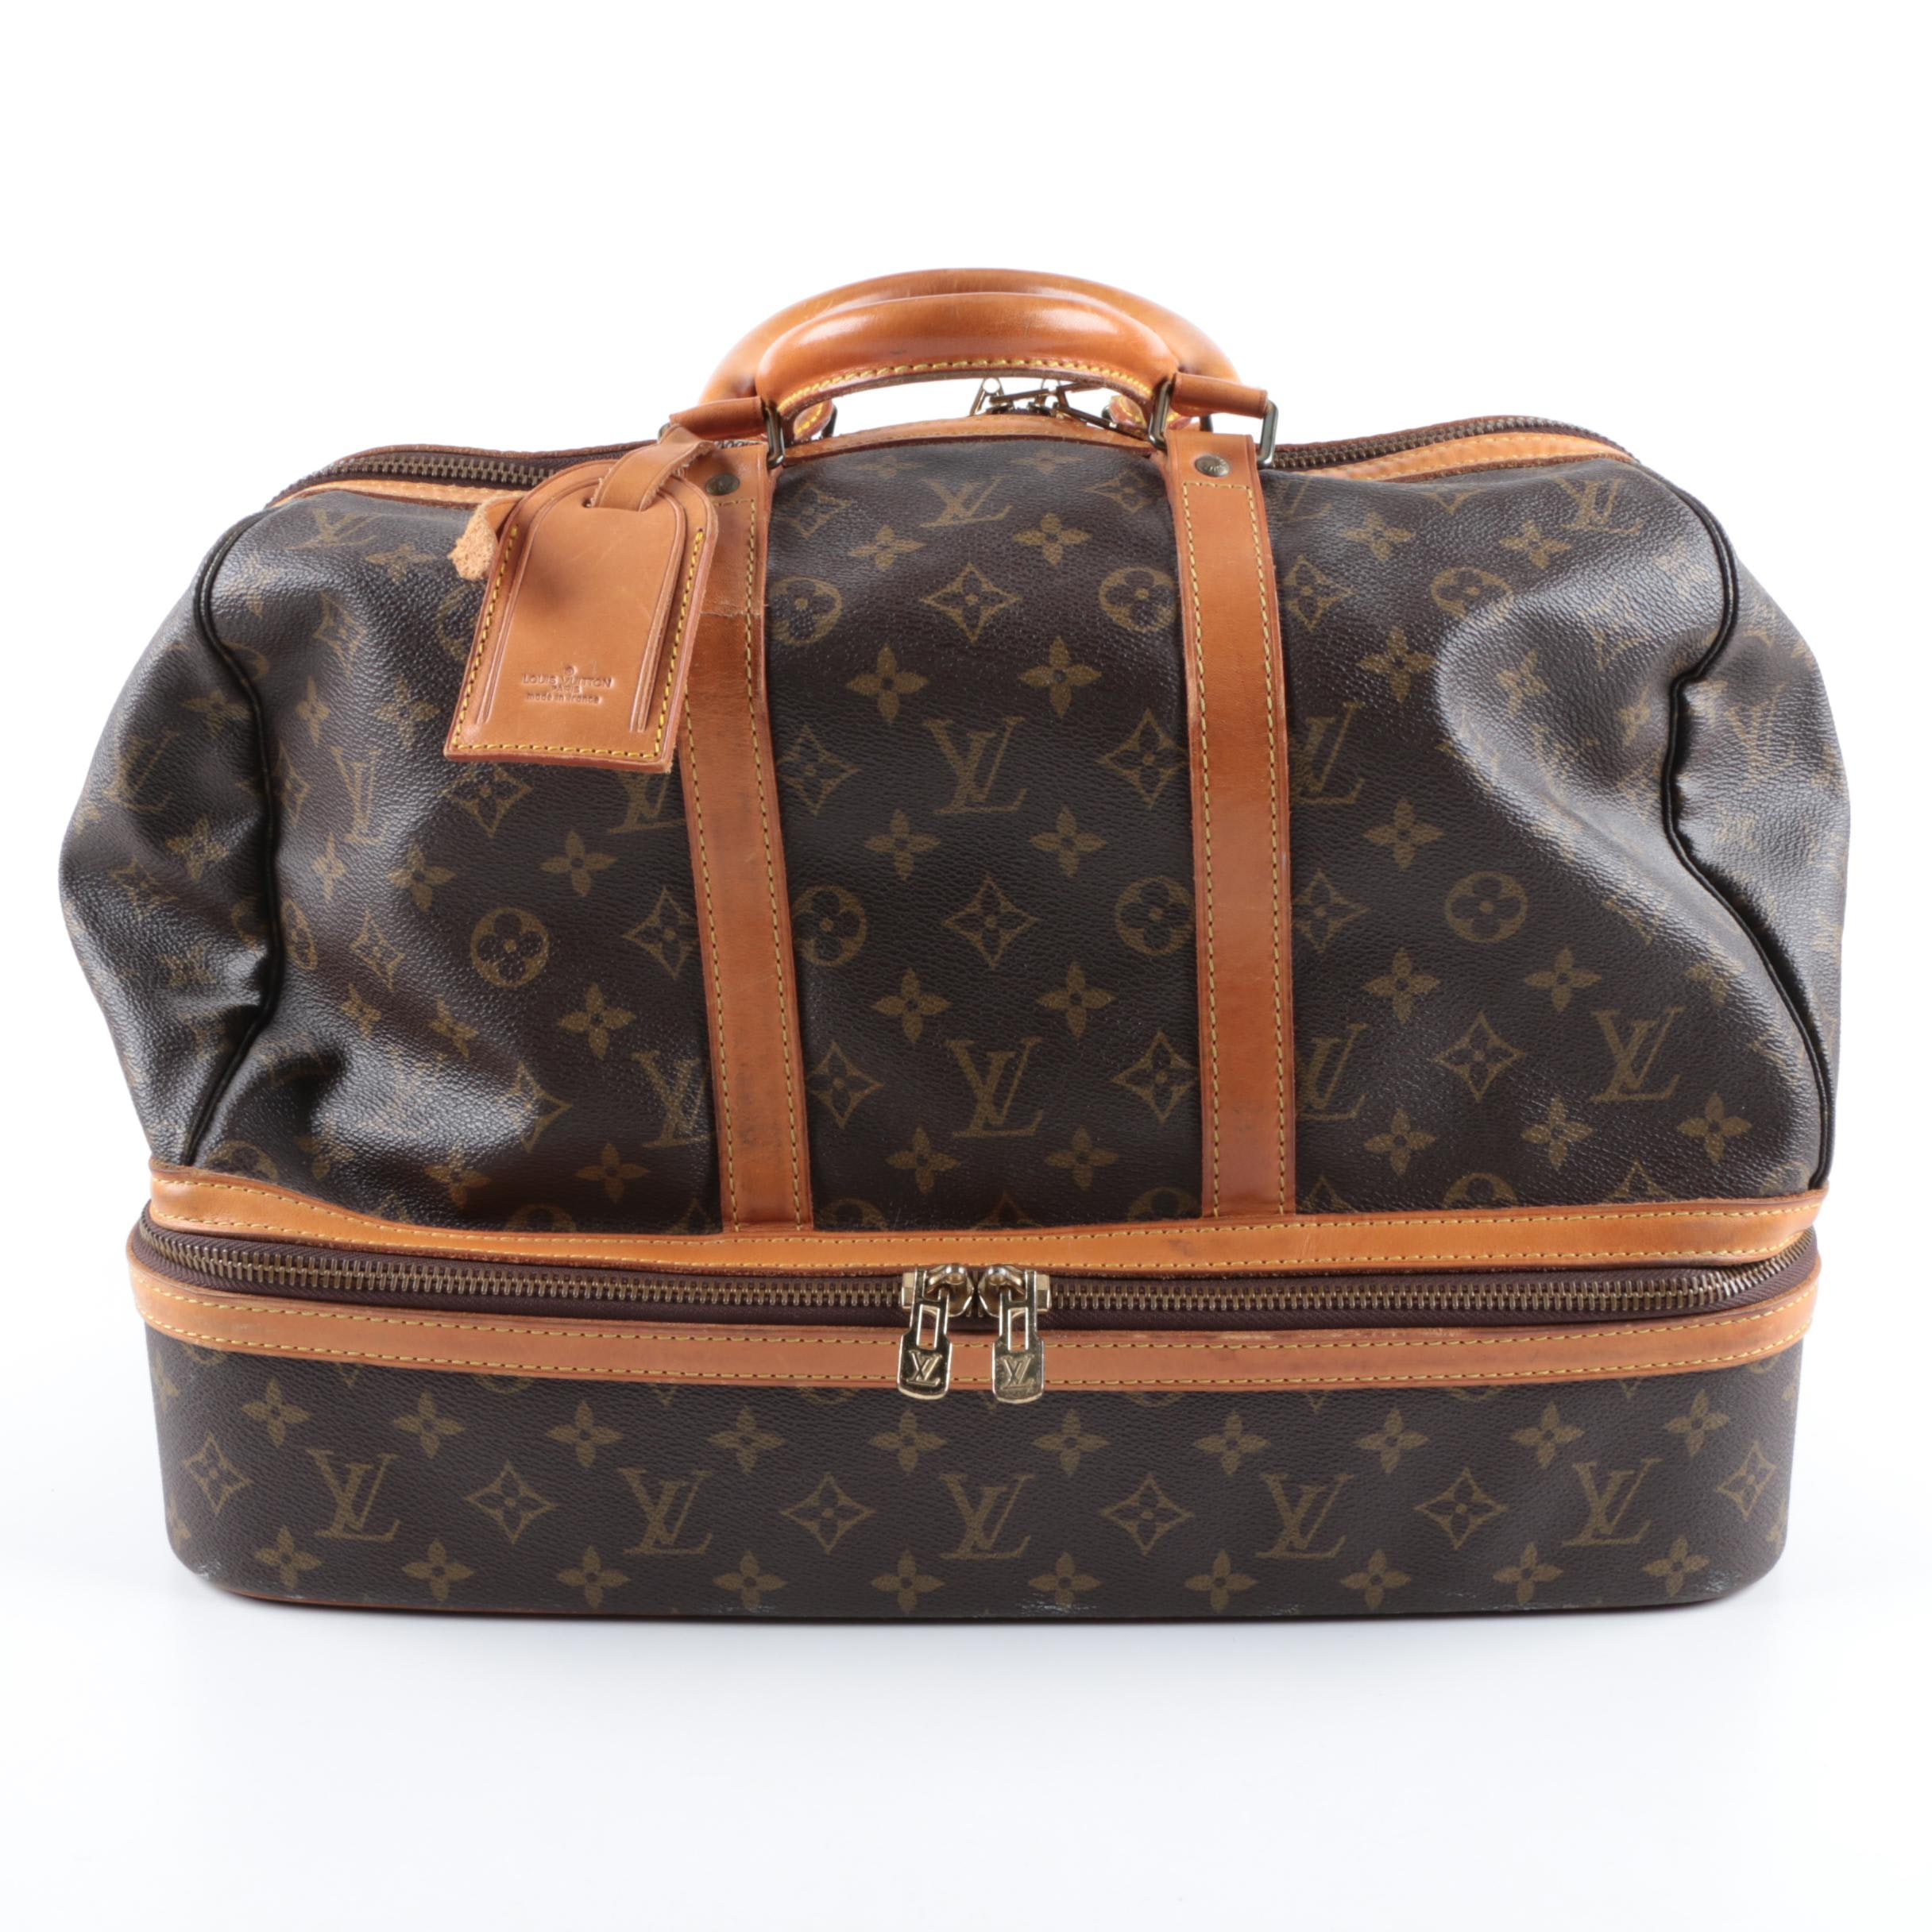 Vintage Louis Vuitton Sac Sport Monogram Travel Bag